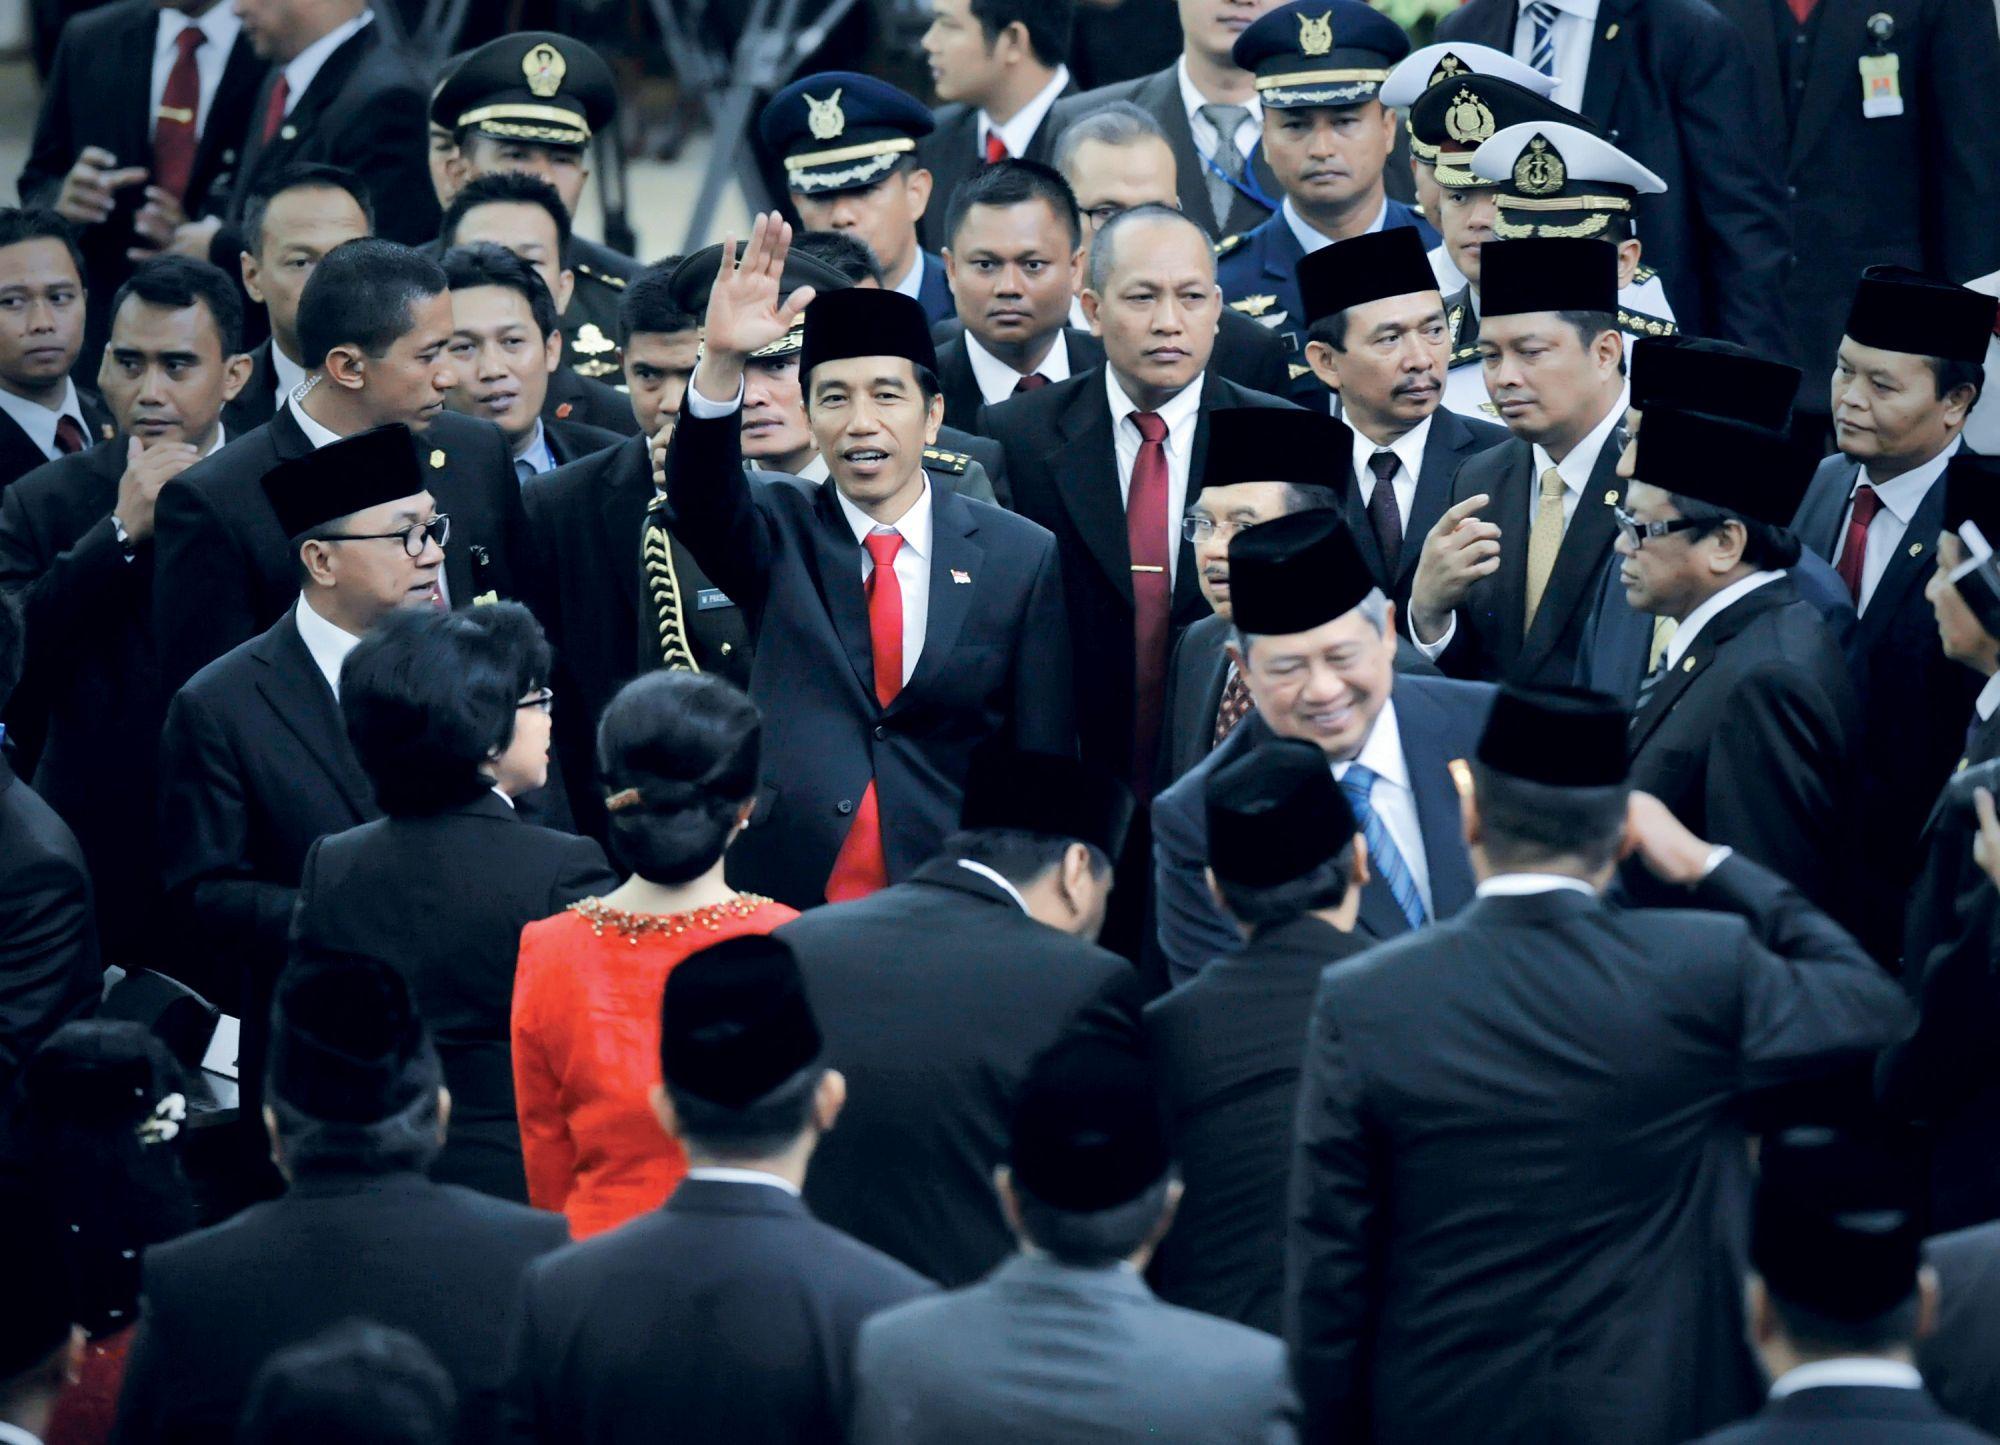 Will Indonesian President Joko Widodo Secure A Second Term?